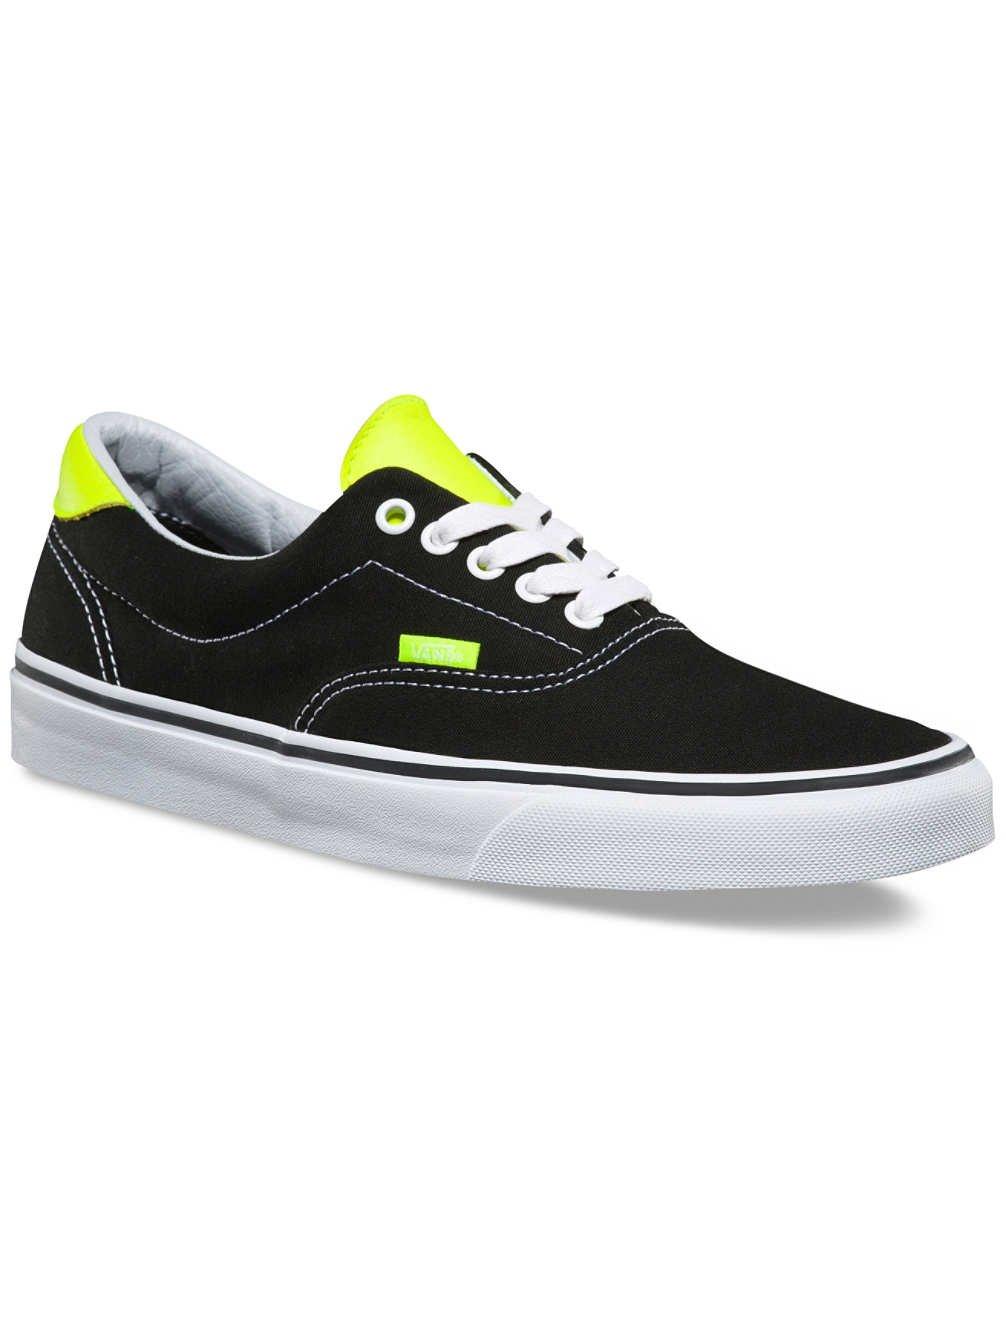 dab2820cd9 Galleon - Vans Unisex Era 59 (Neon Leather) Black Neon Yellow Men s ...